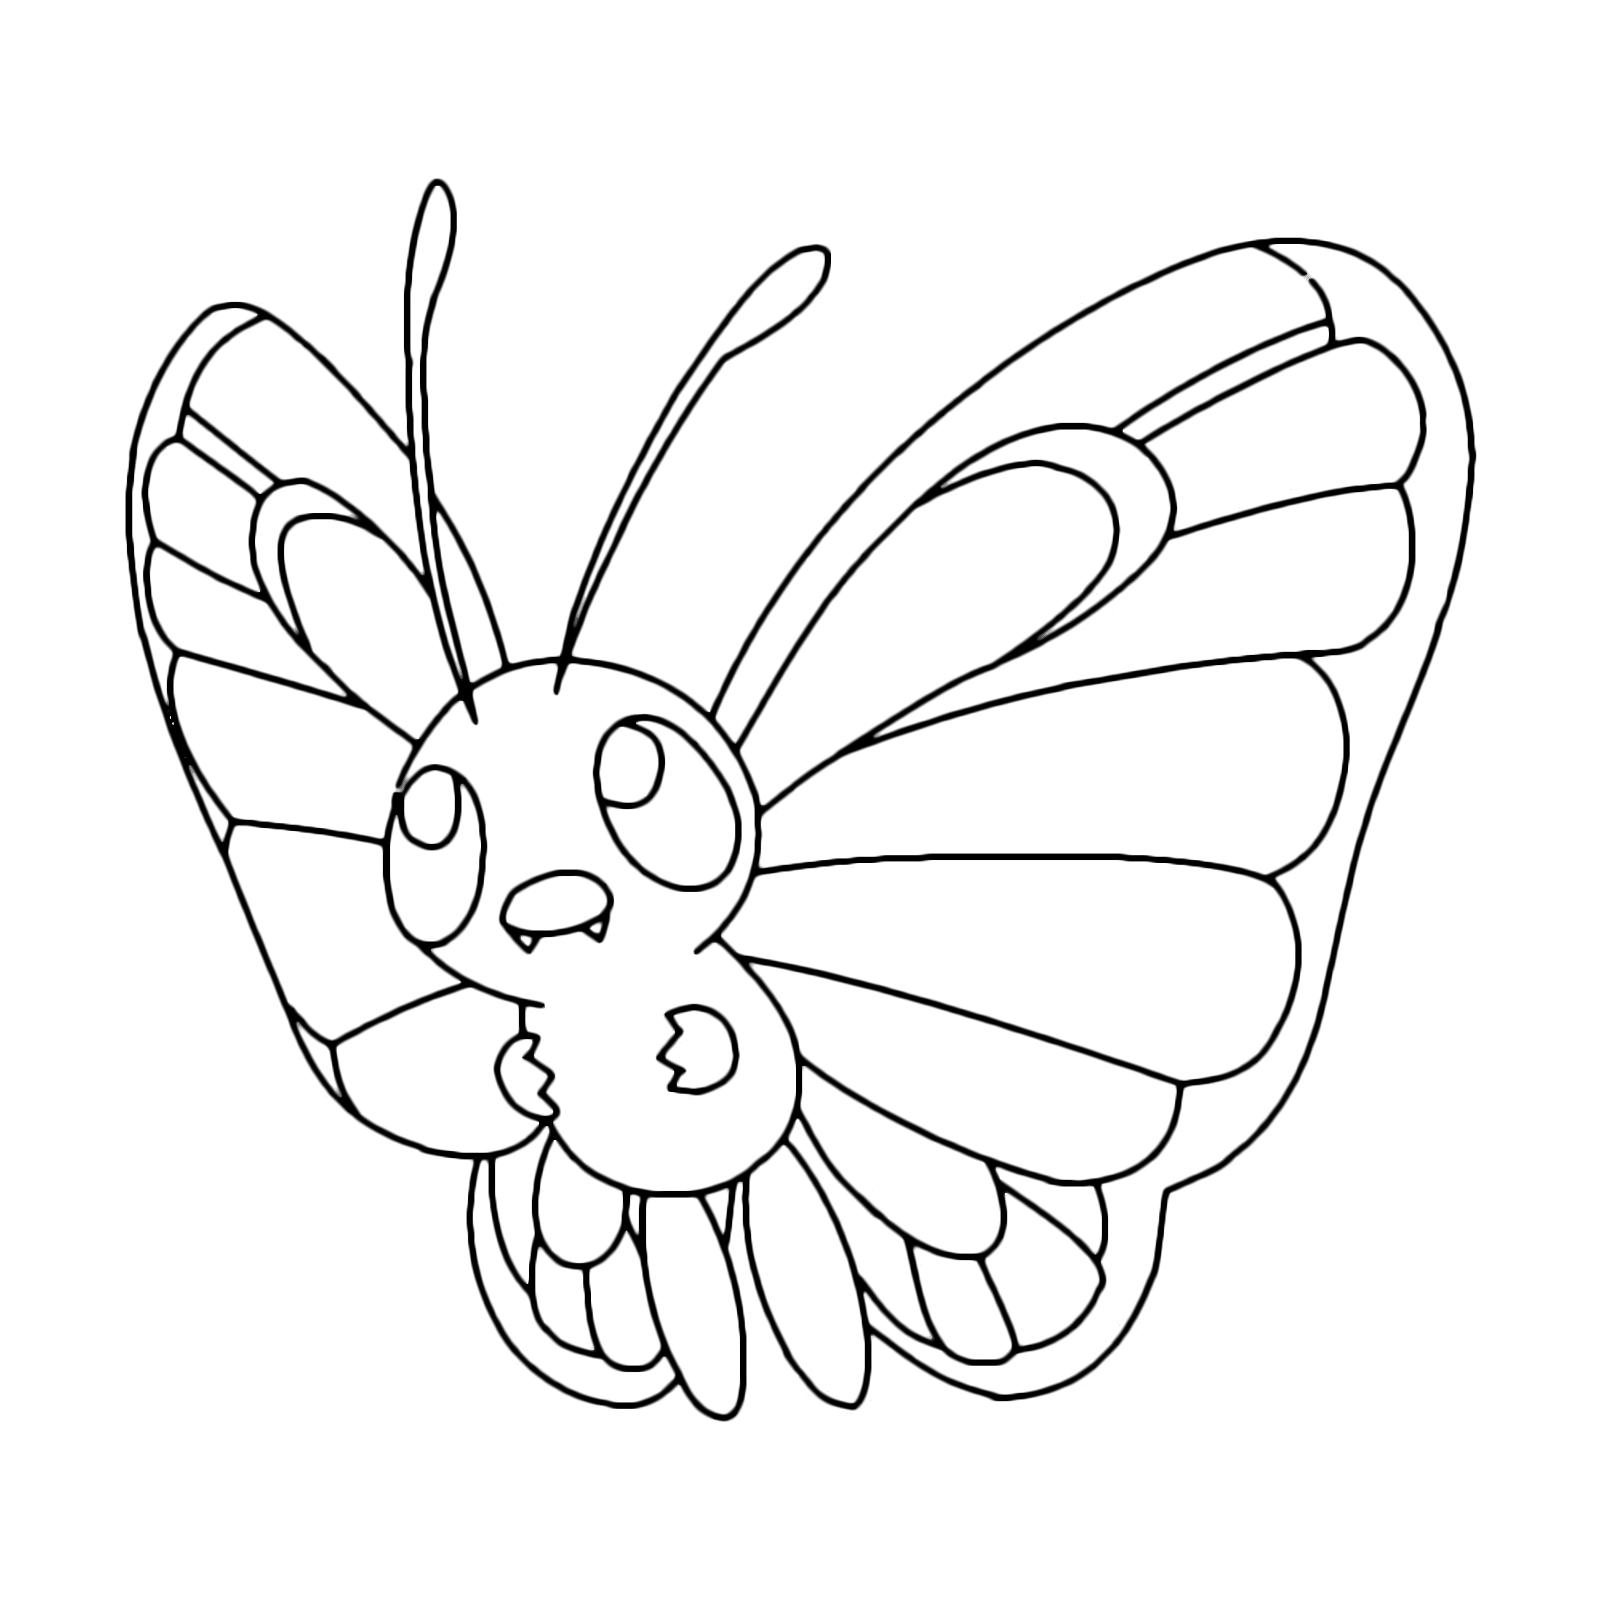 Pokémon - Gen. 1 - Butterfree - 12 - Coleottero volante